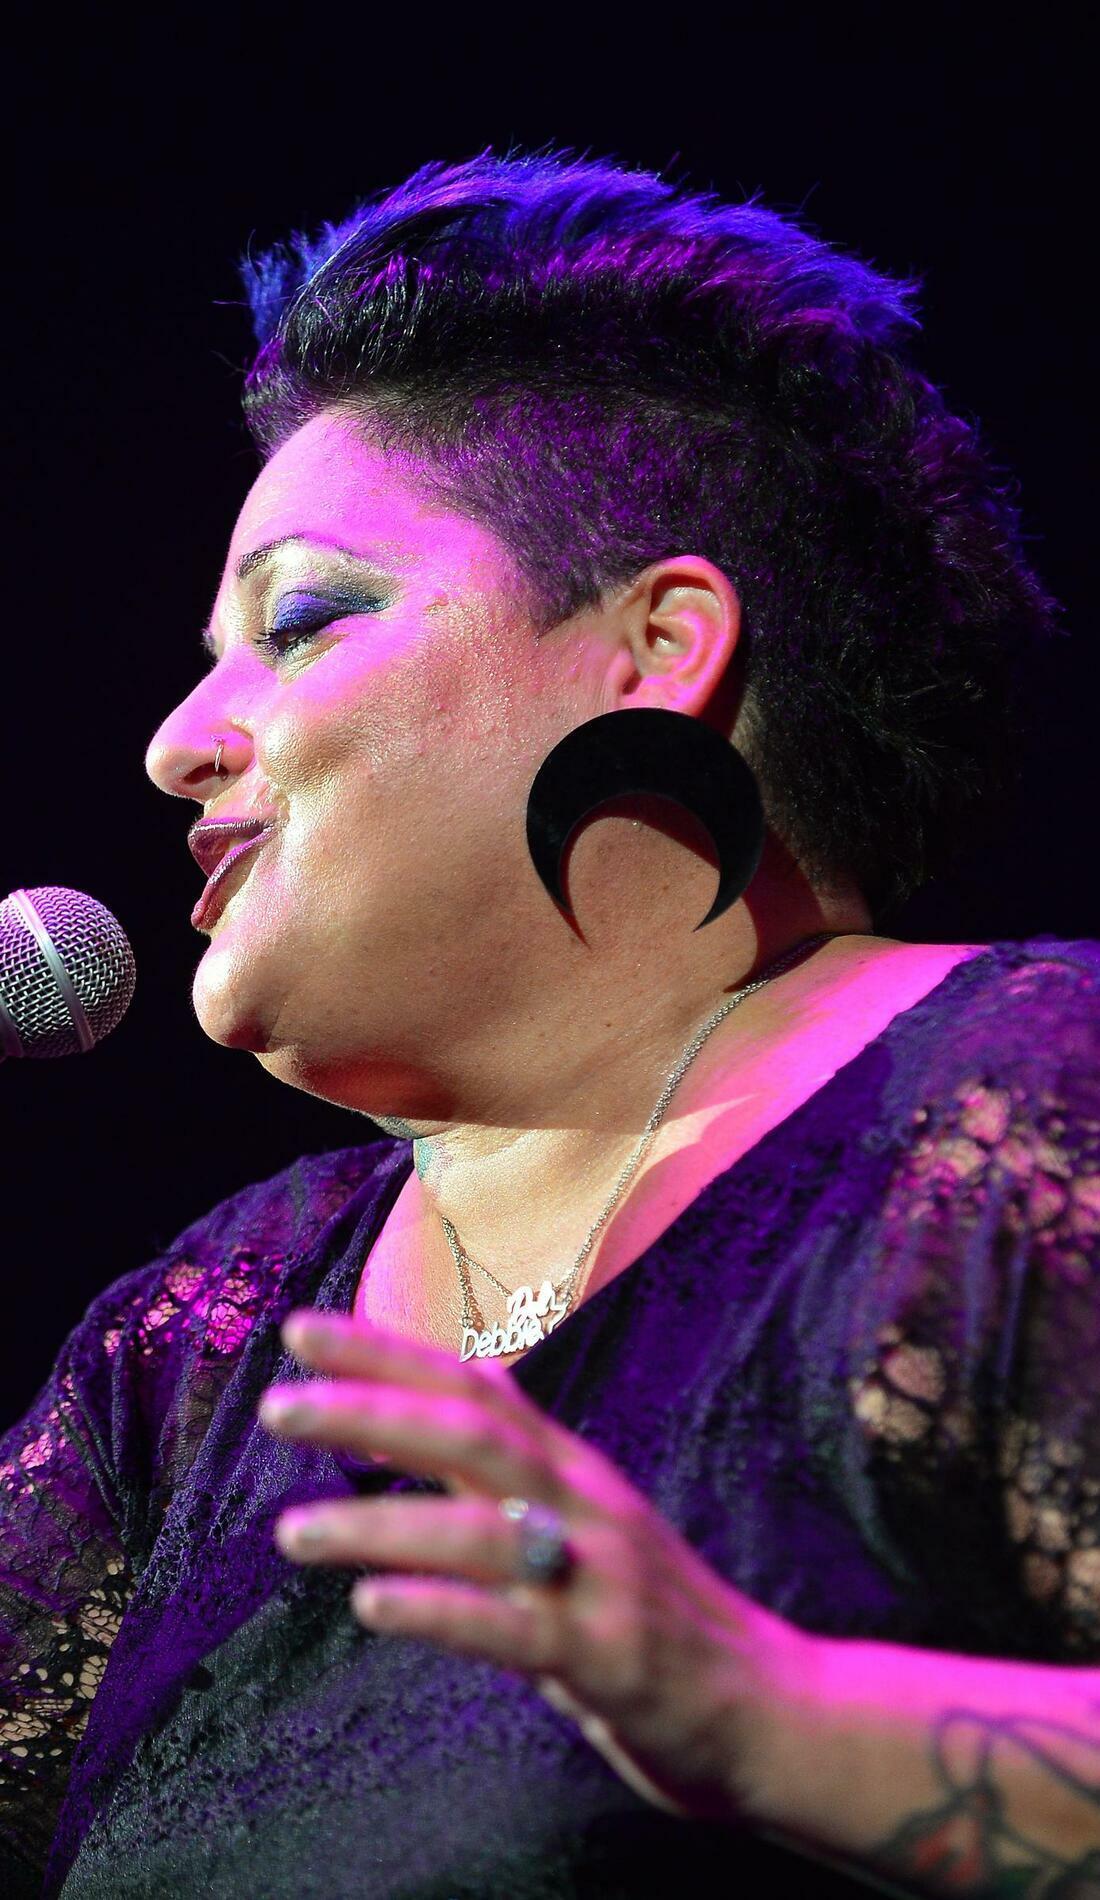 A Debbie Deb live event